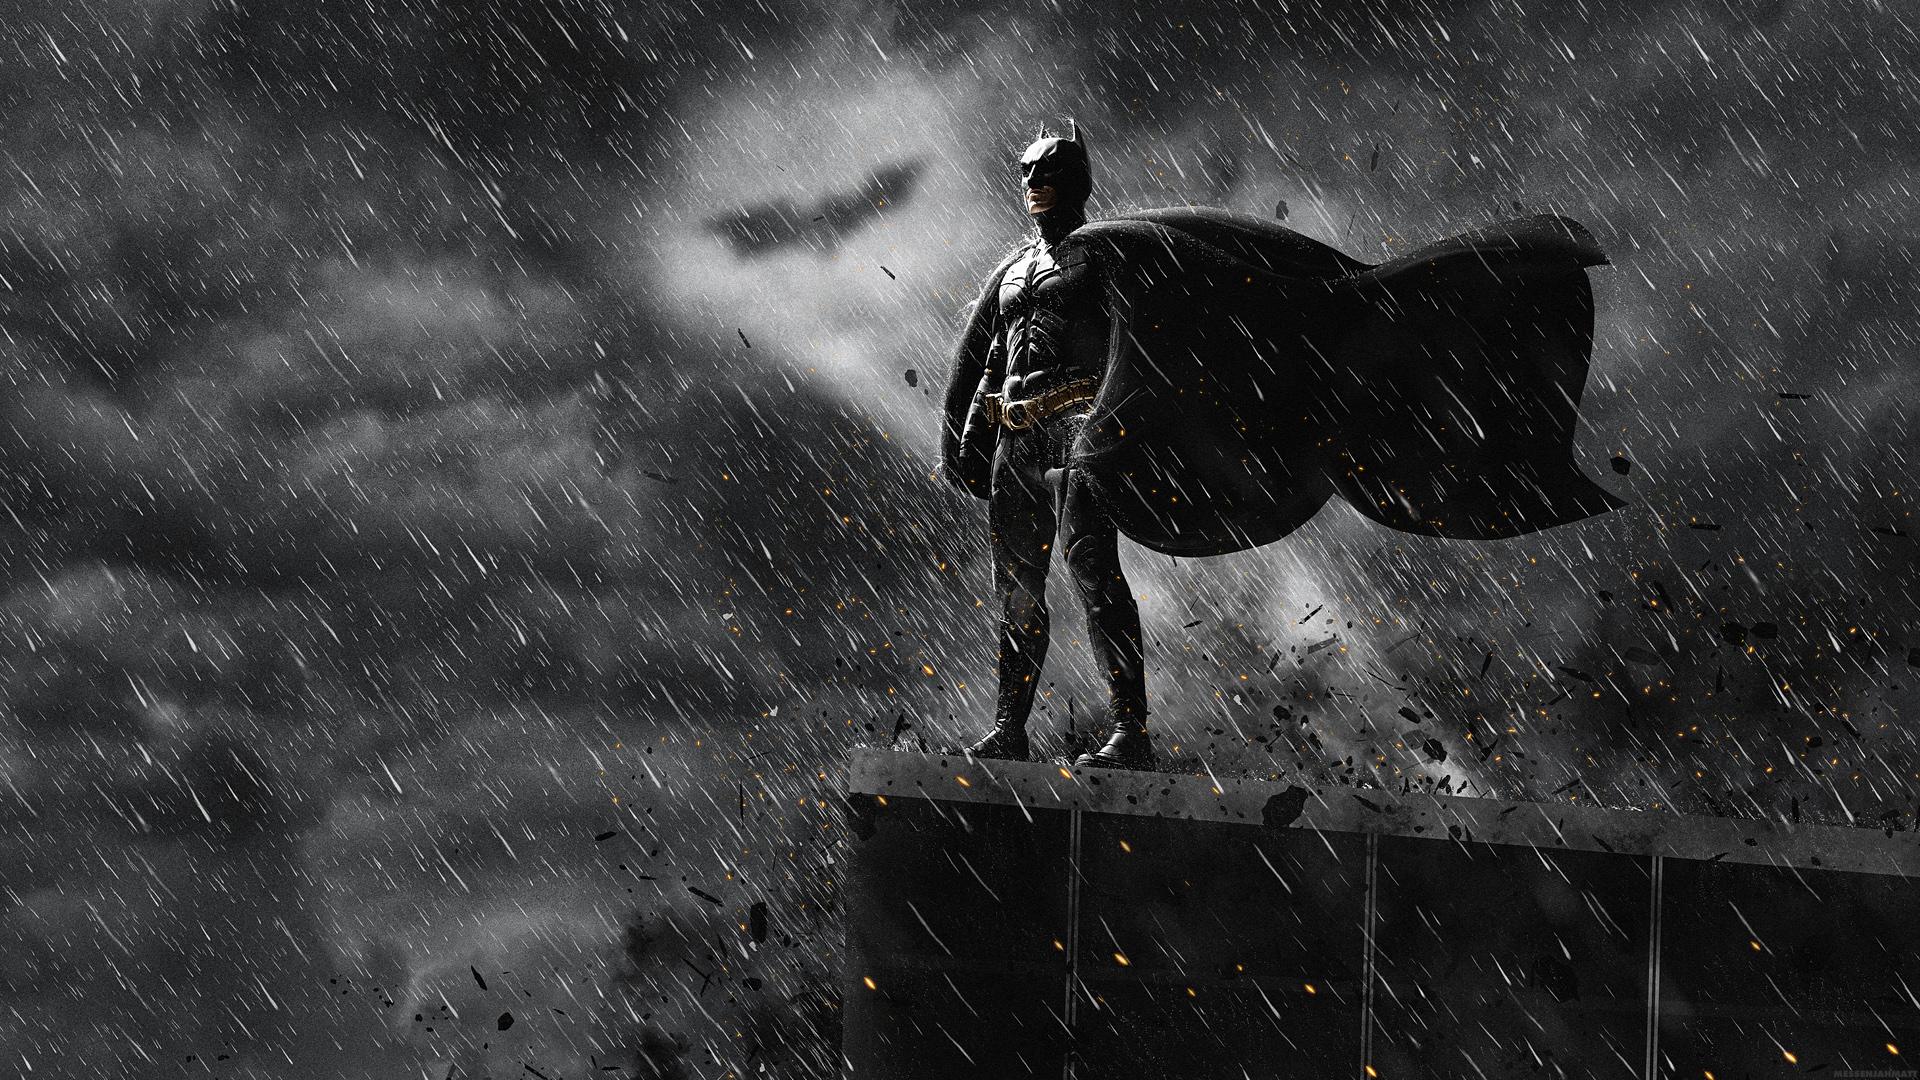 Dark Knight Batman Wallpaper For Iphone 1920x1080 Download Hd Wallpaper Wallpapertip